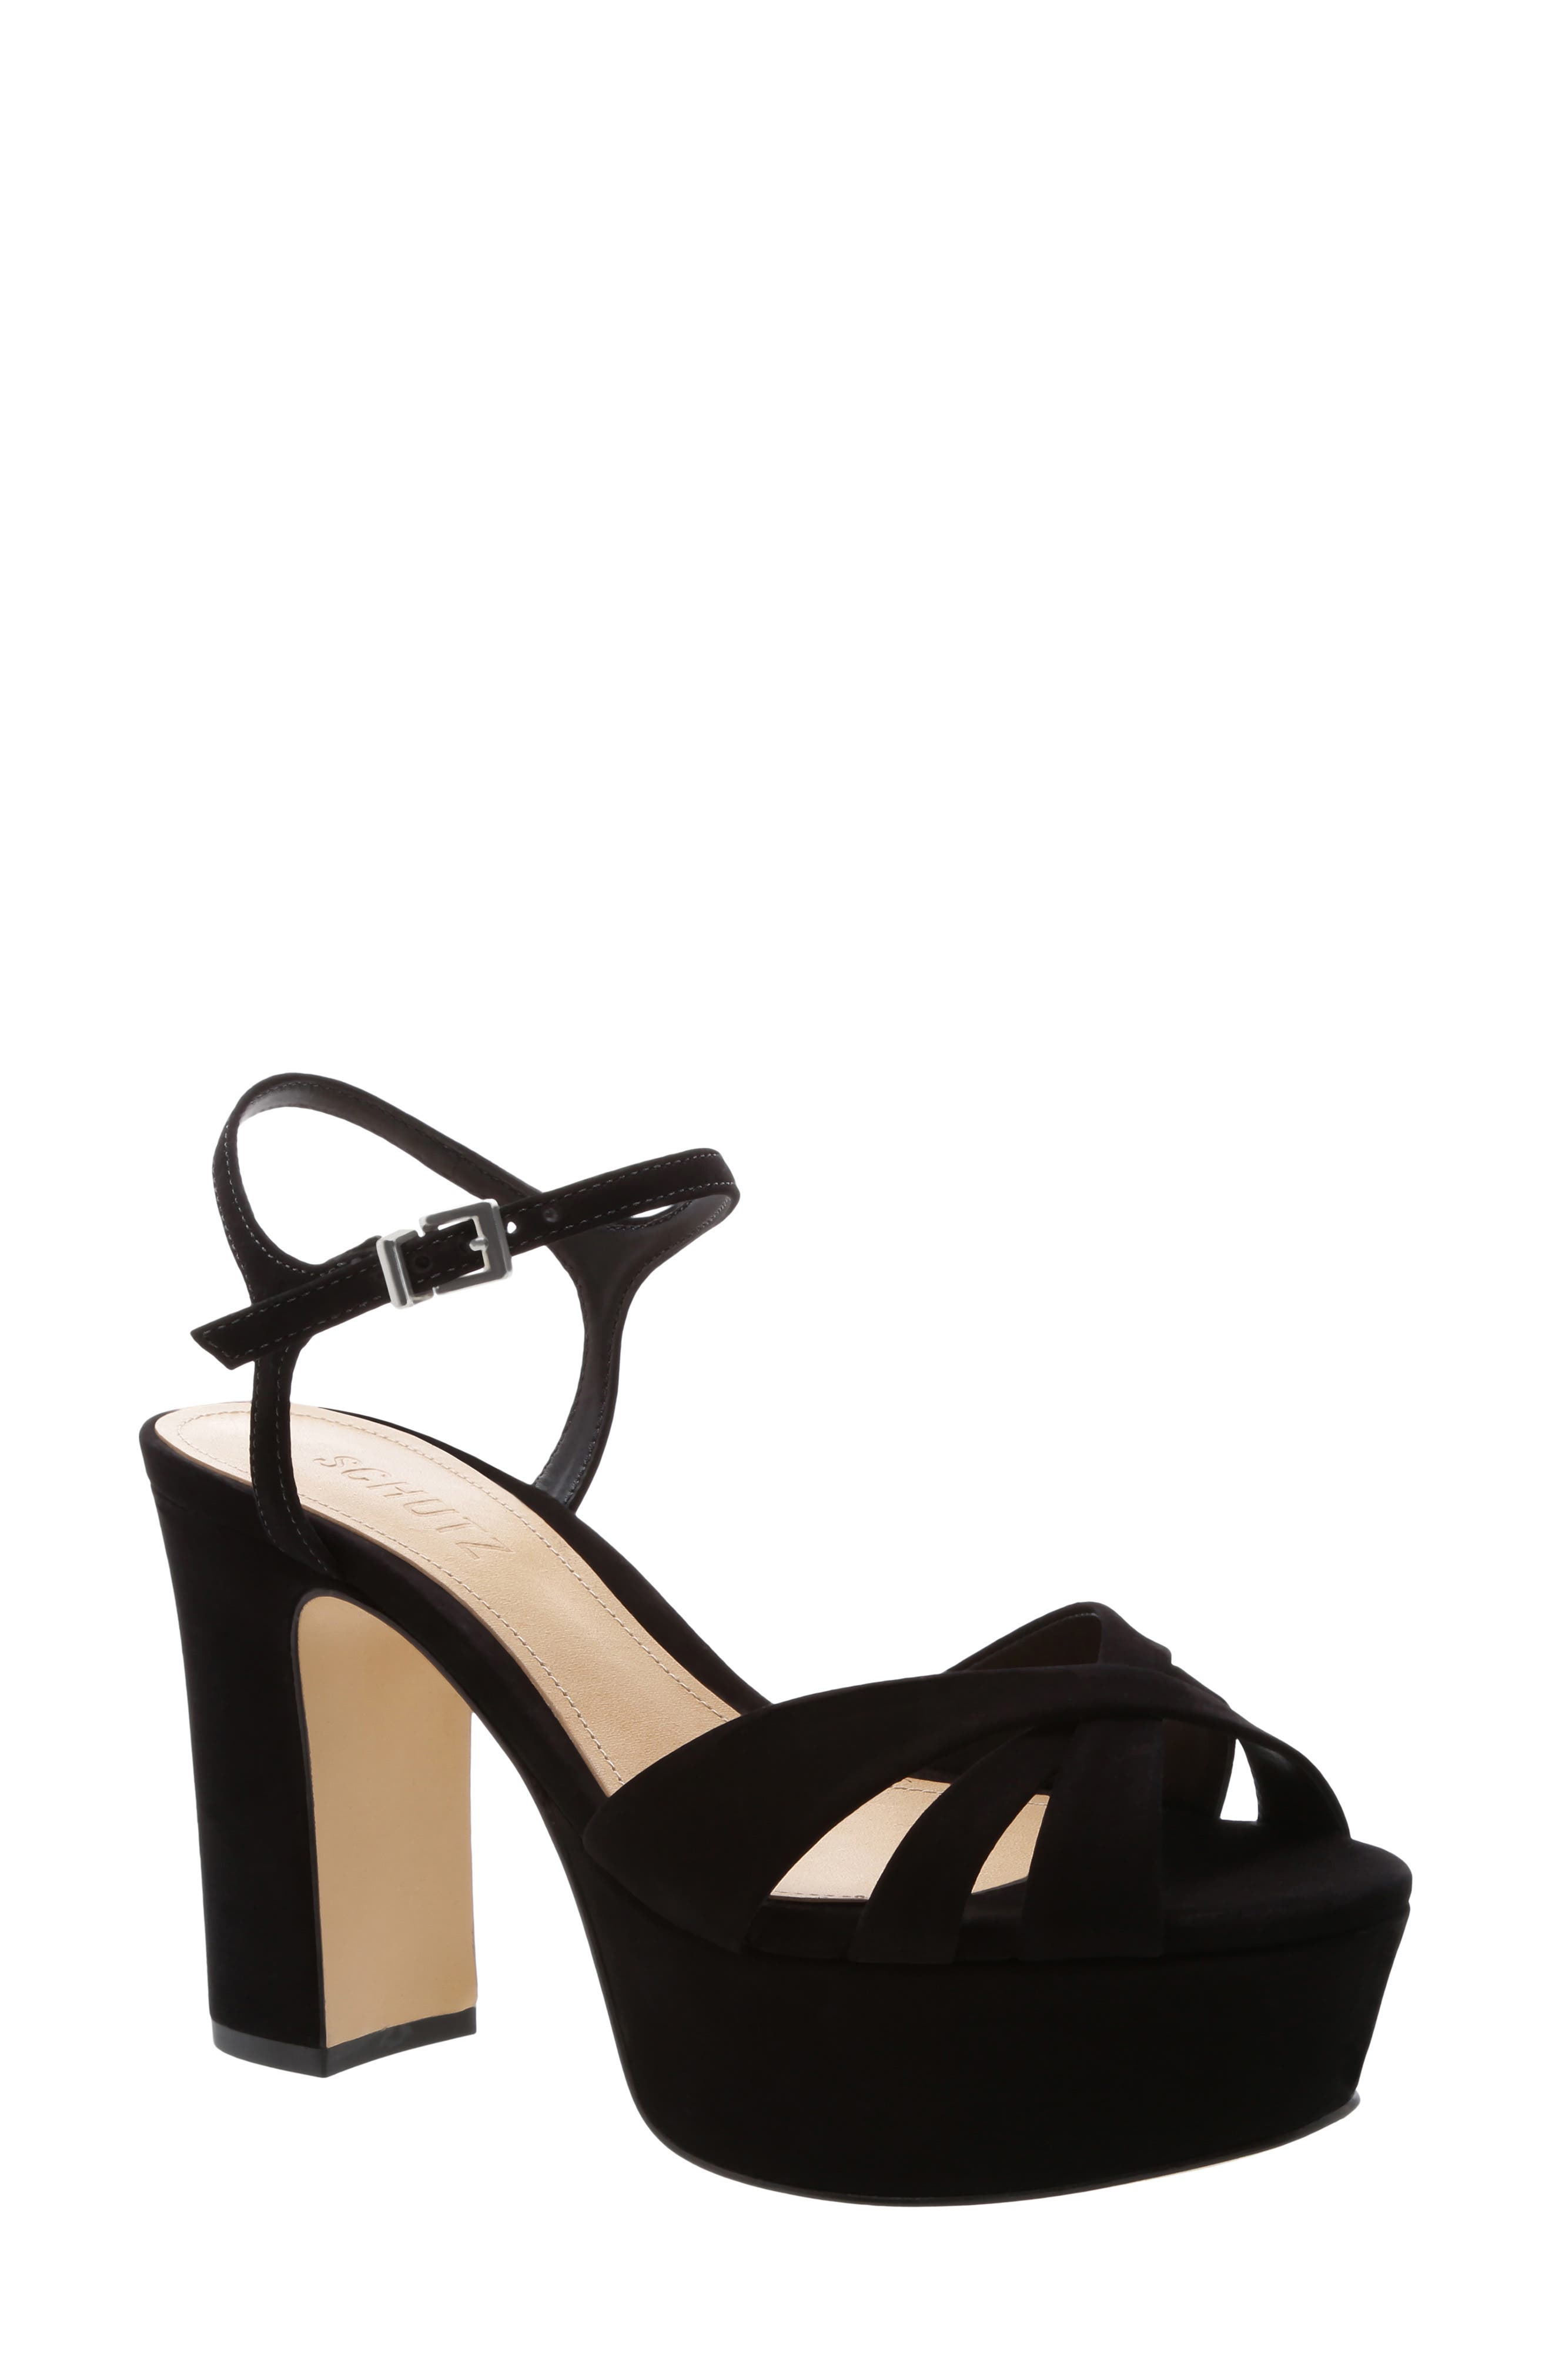 SCHUTZ Keefa Platform Sandal, Main, color, BLACK NUBUCK LEATHER